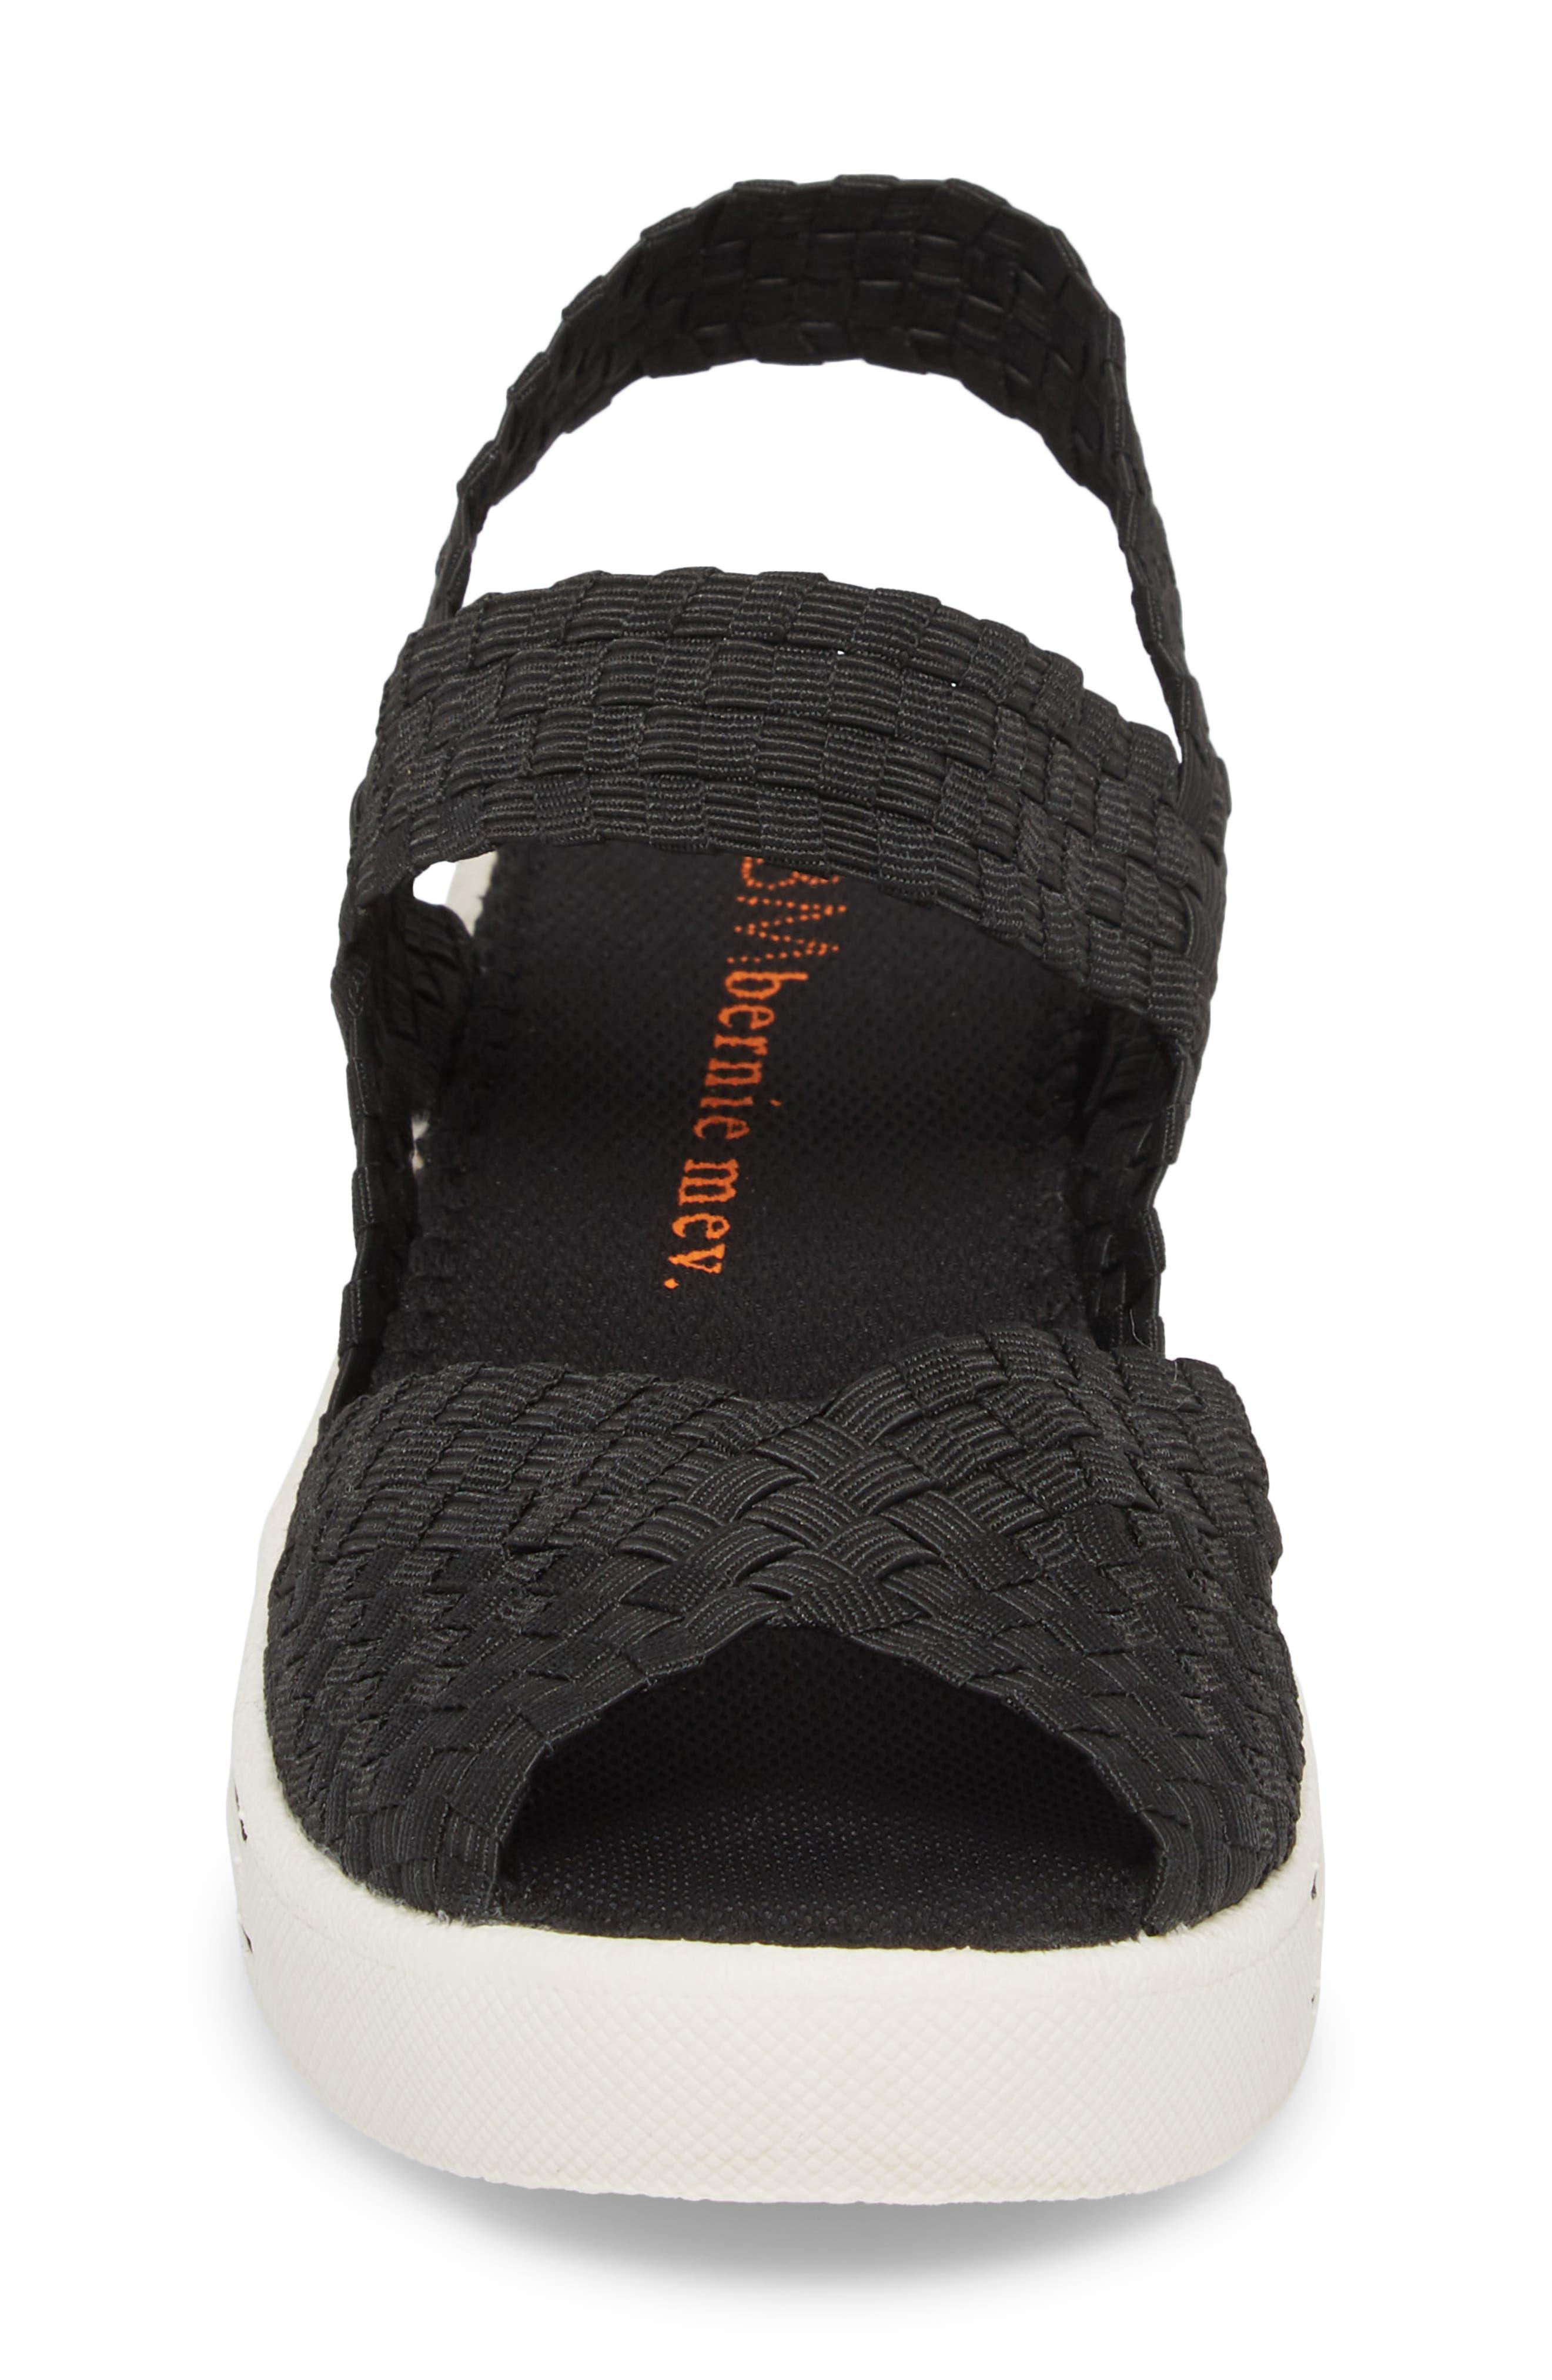 Lux Garden Sandal,                             Alternate thumbnail 4, color,                             BLACK FABRIC